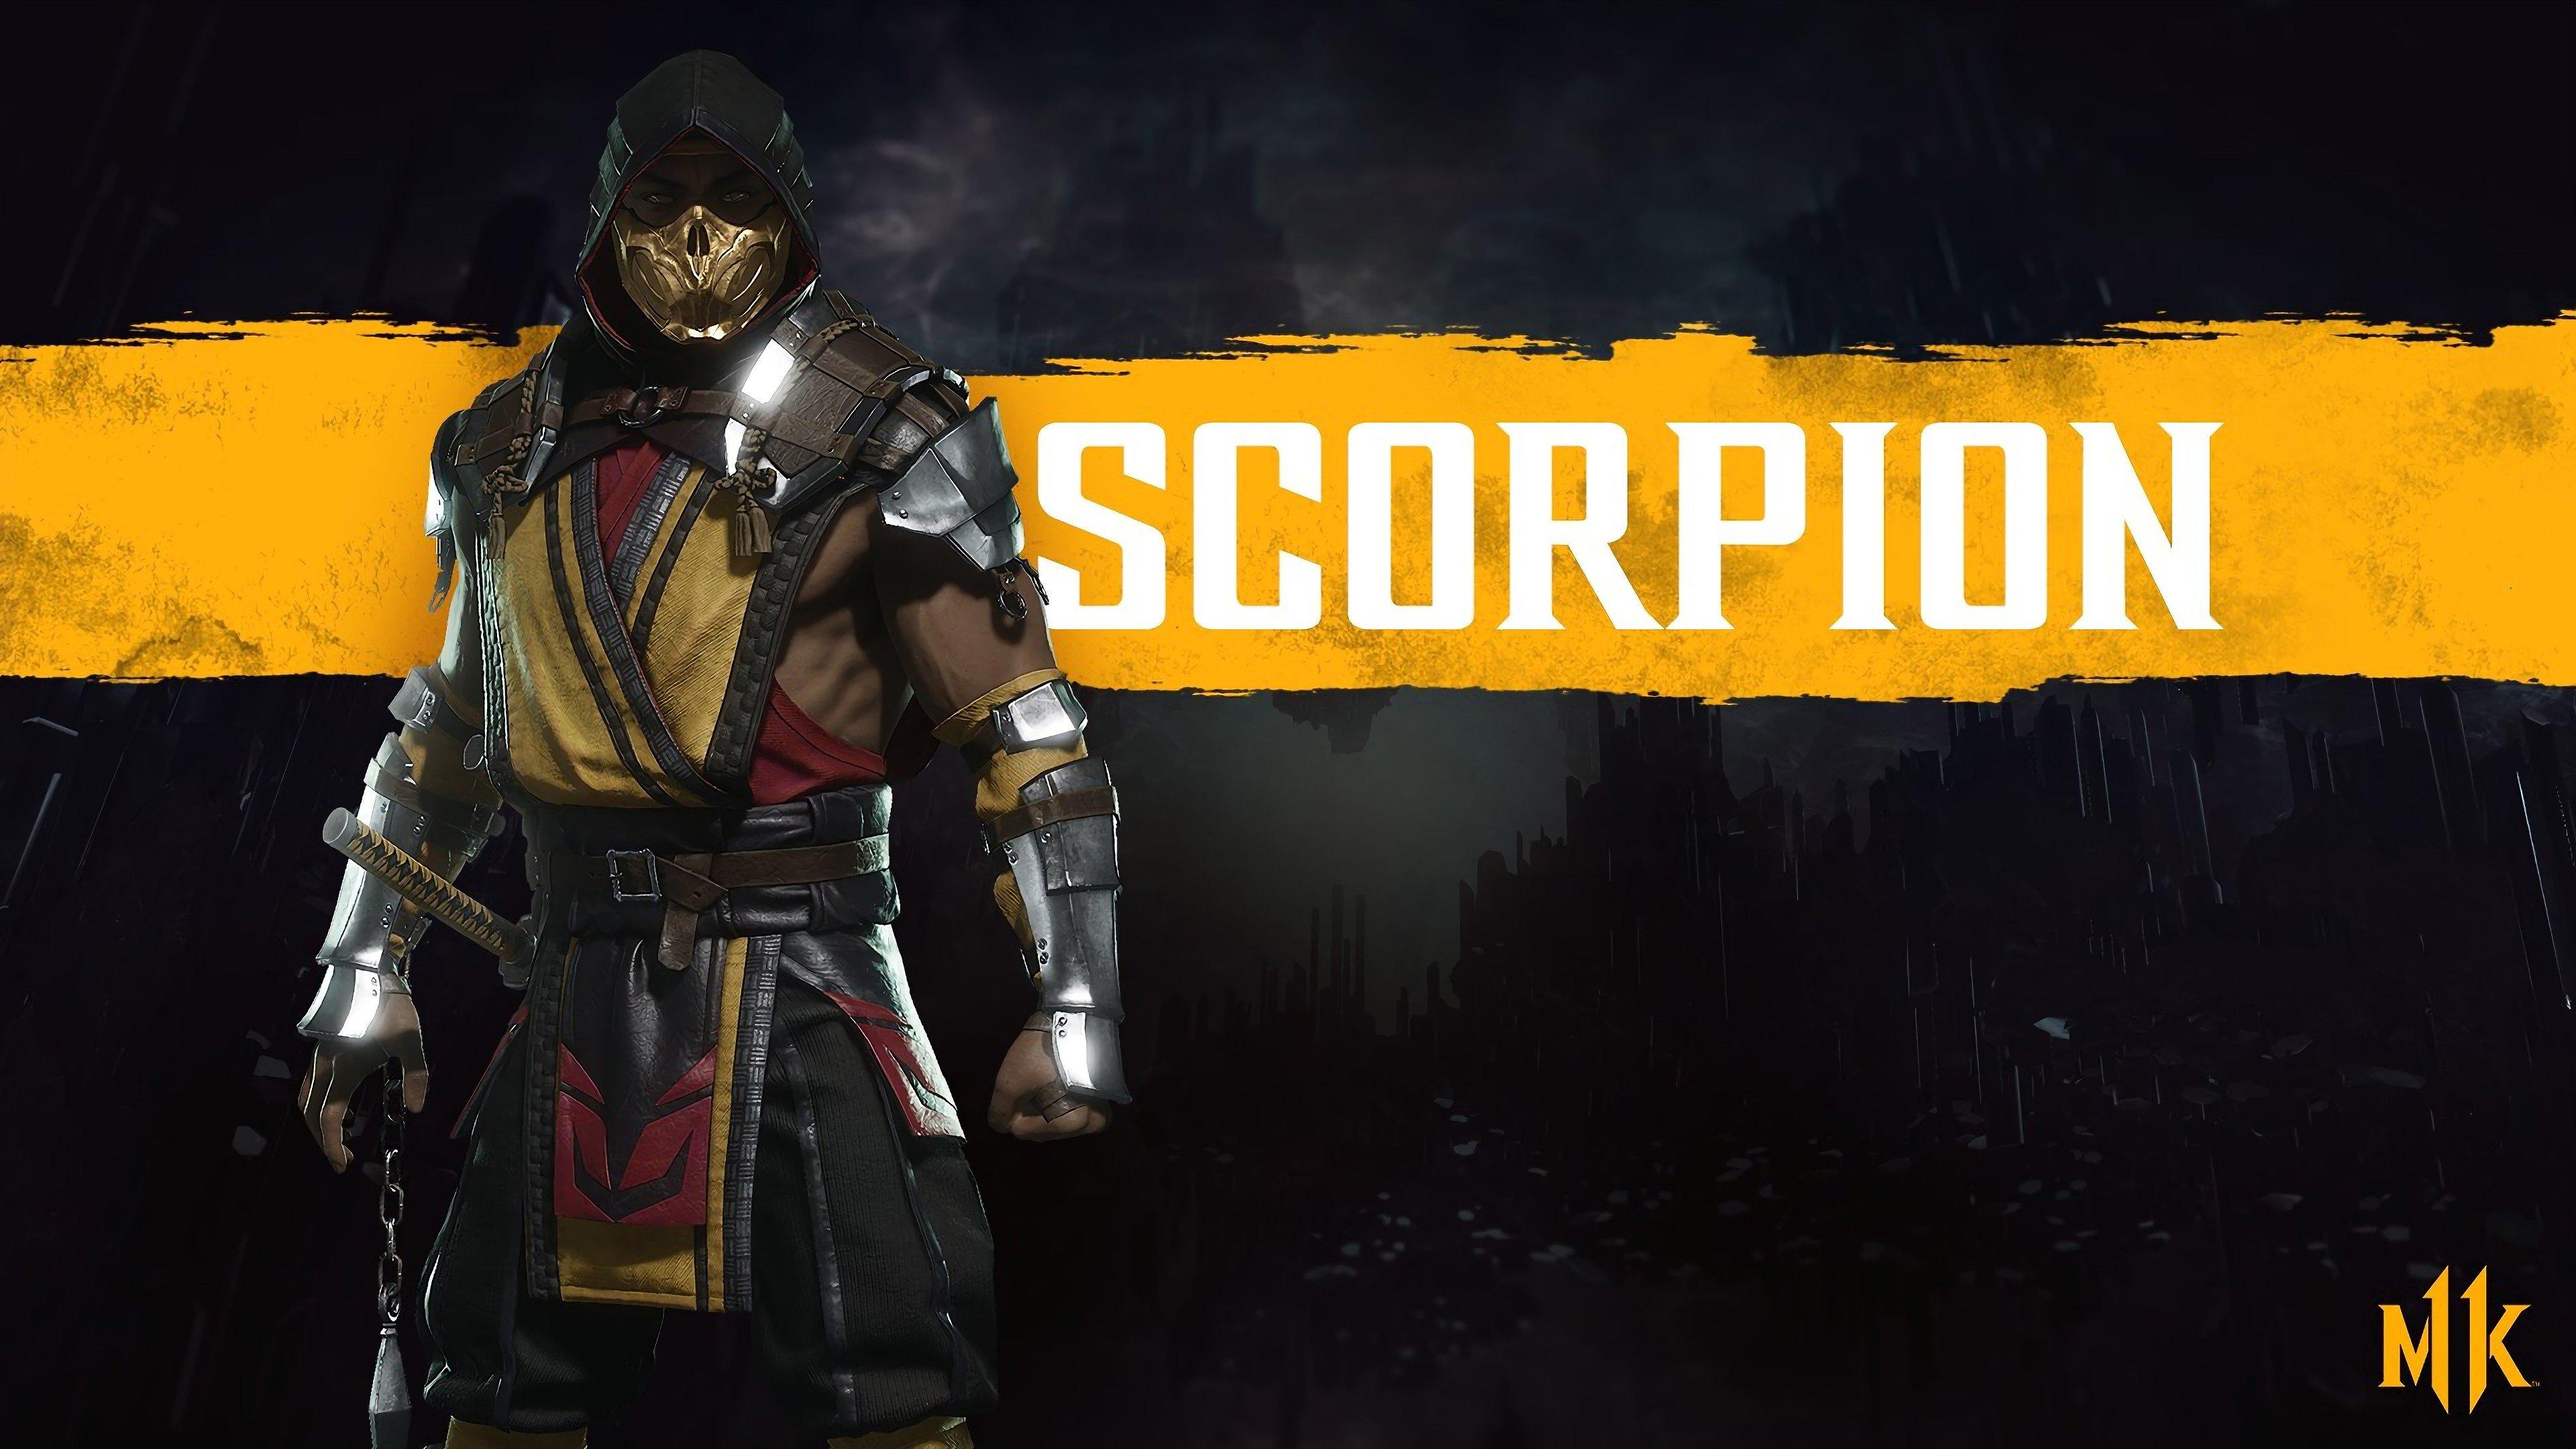 Fondos de pantalla Scorpion de Mortal Kombat